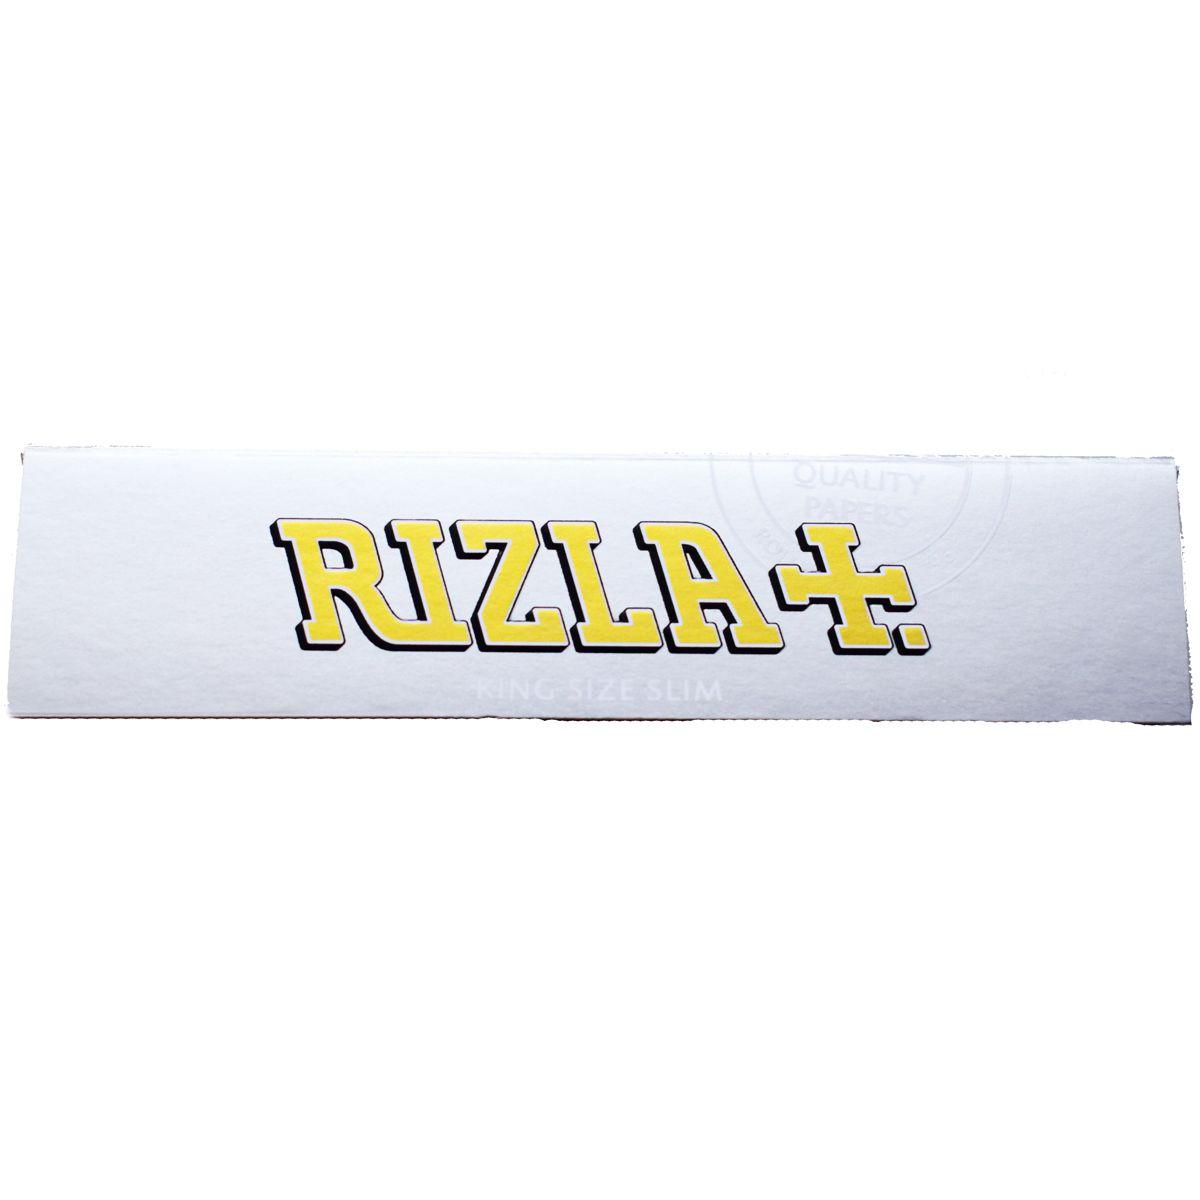 papel rizla silver regular king size